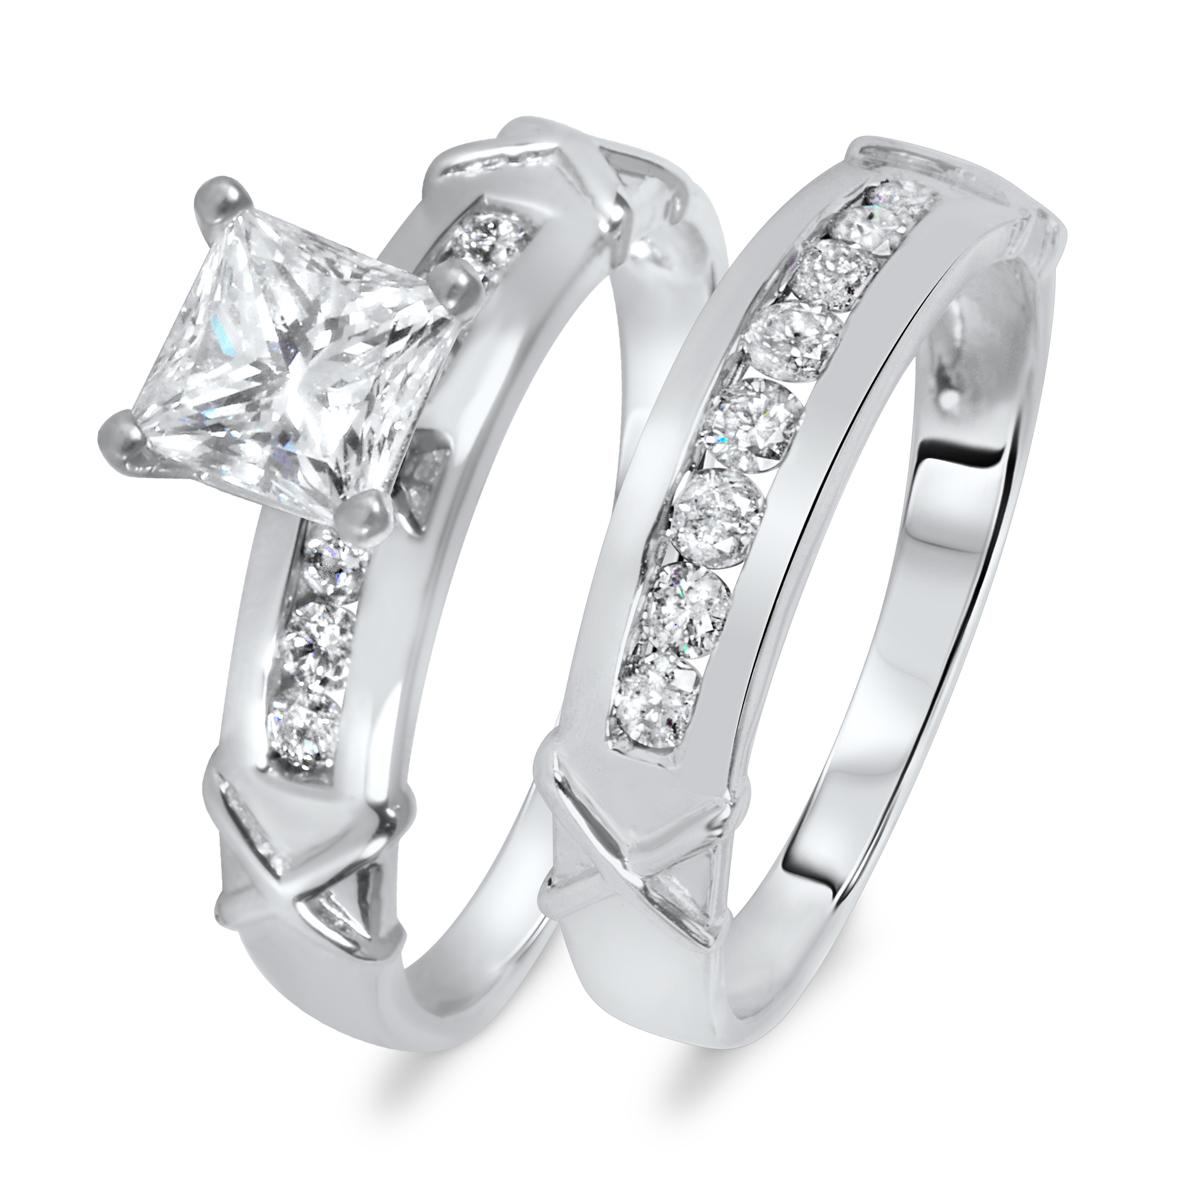 1 1/2 CT. T.W. Diamond Women's Bridal Wedding Ring Set 14K White Gold